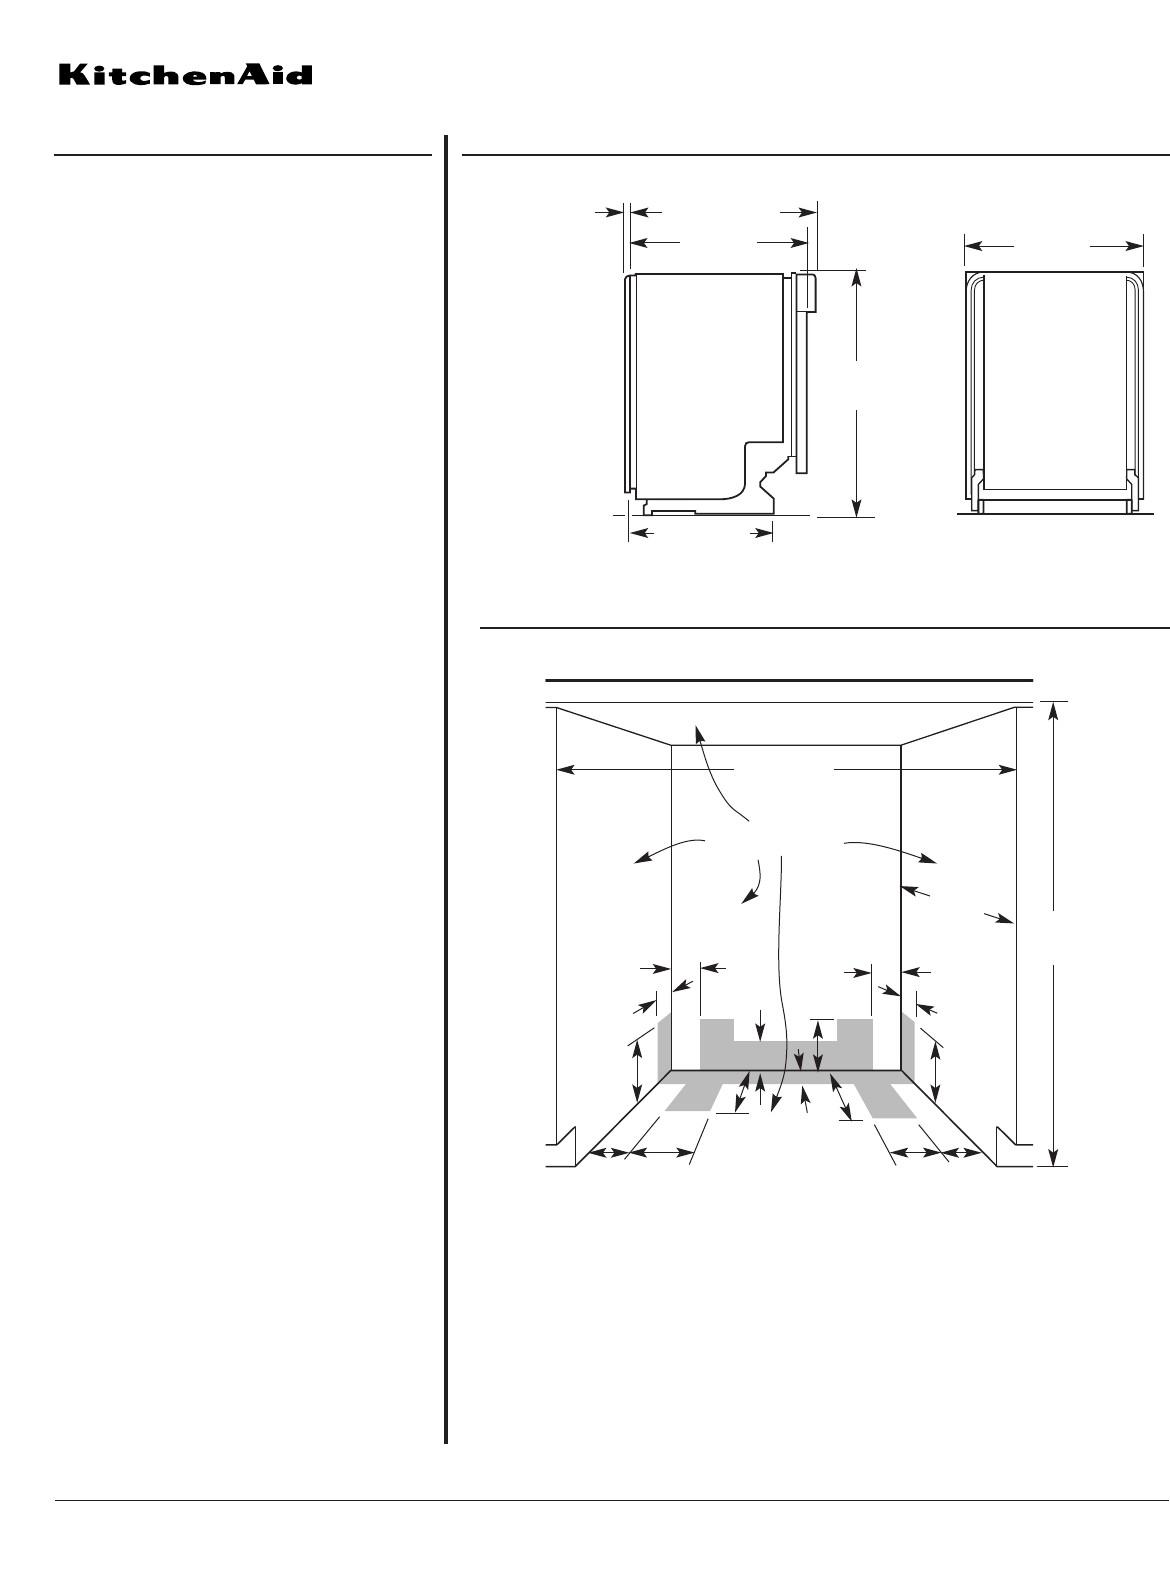 KitchenAid KUDS03FT Dishwasher User Manual